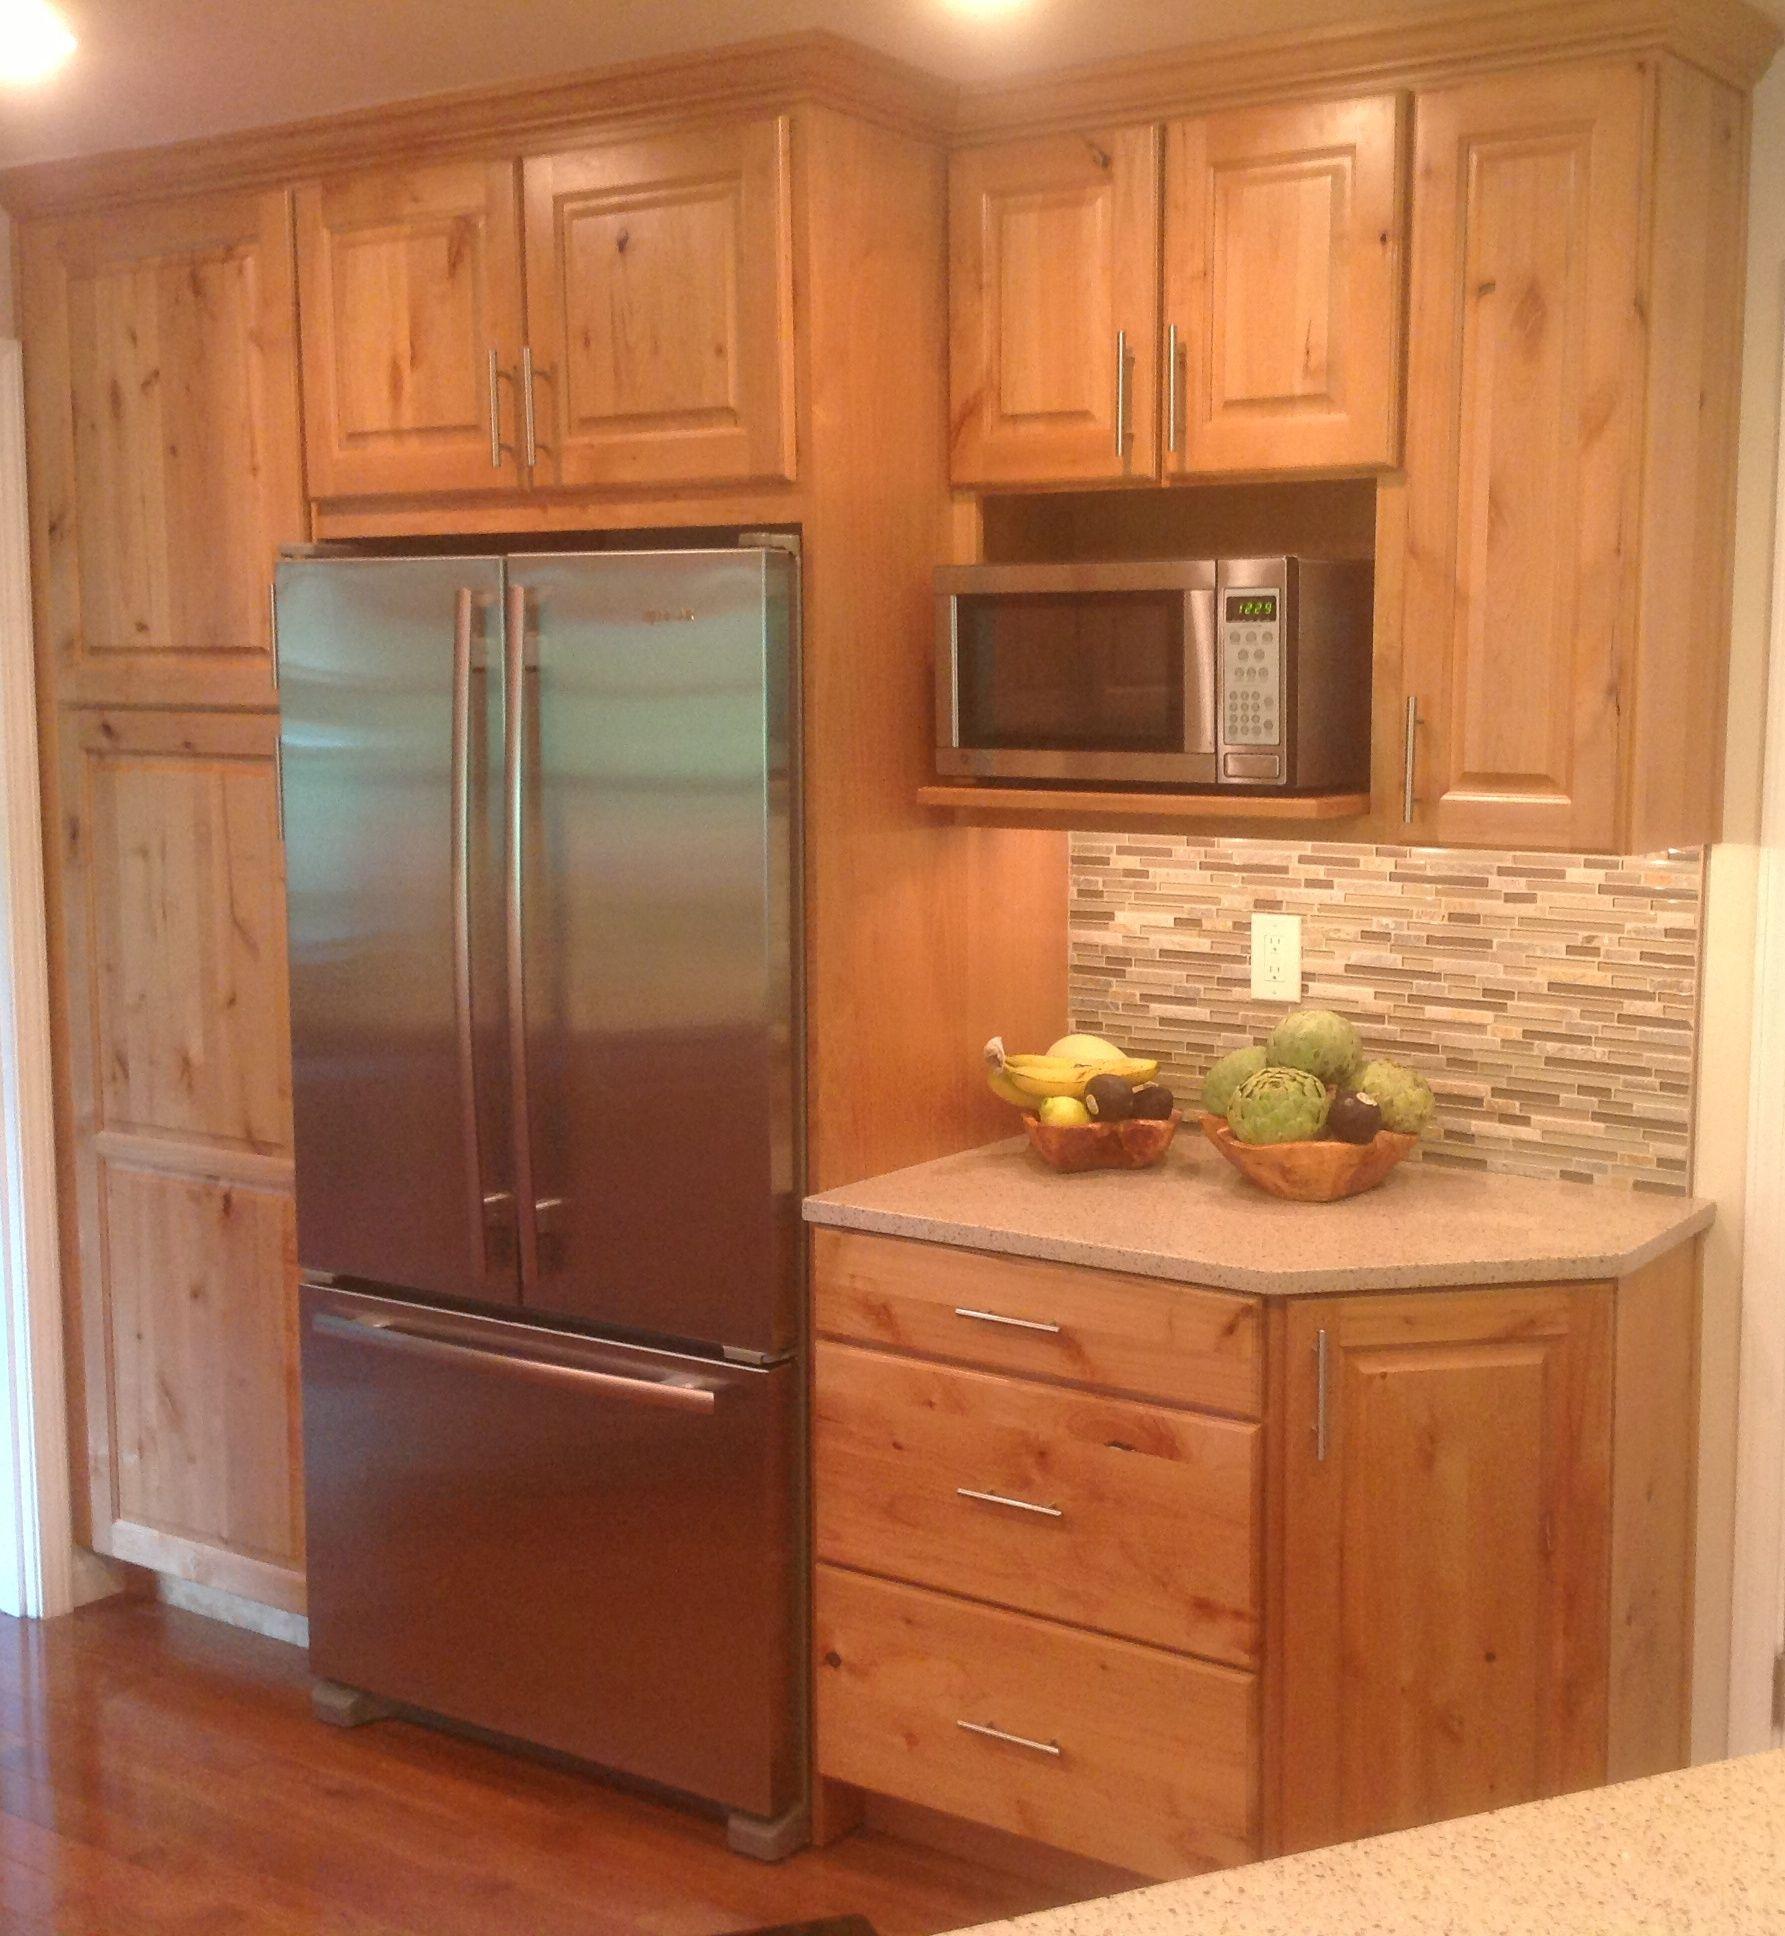 Pine Cabinet Kitchen Ideas: Rustic Alder Cabinets And Quartz Countertops. Www